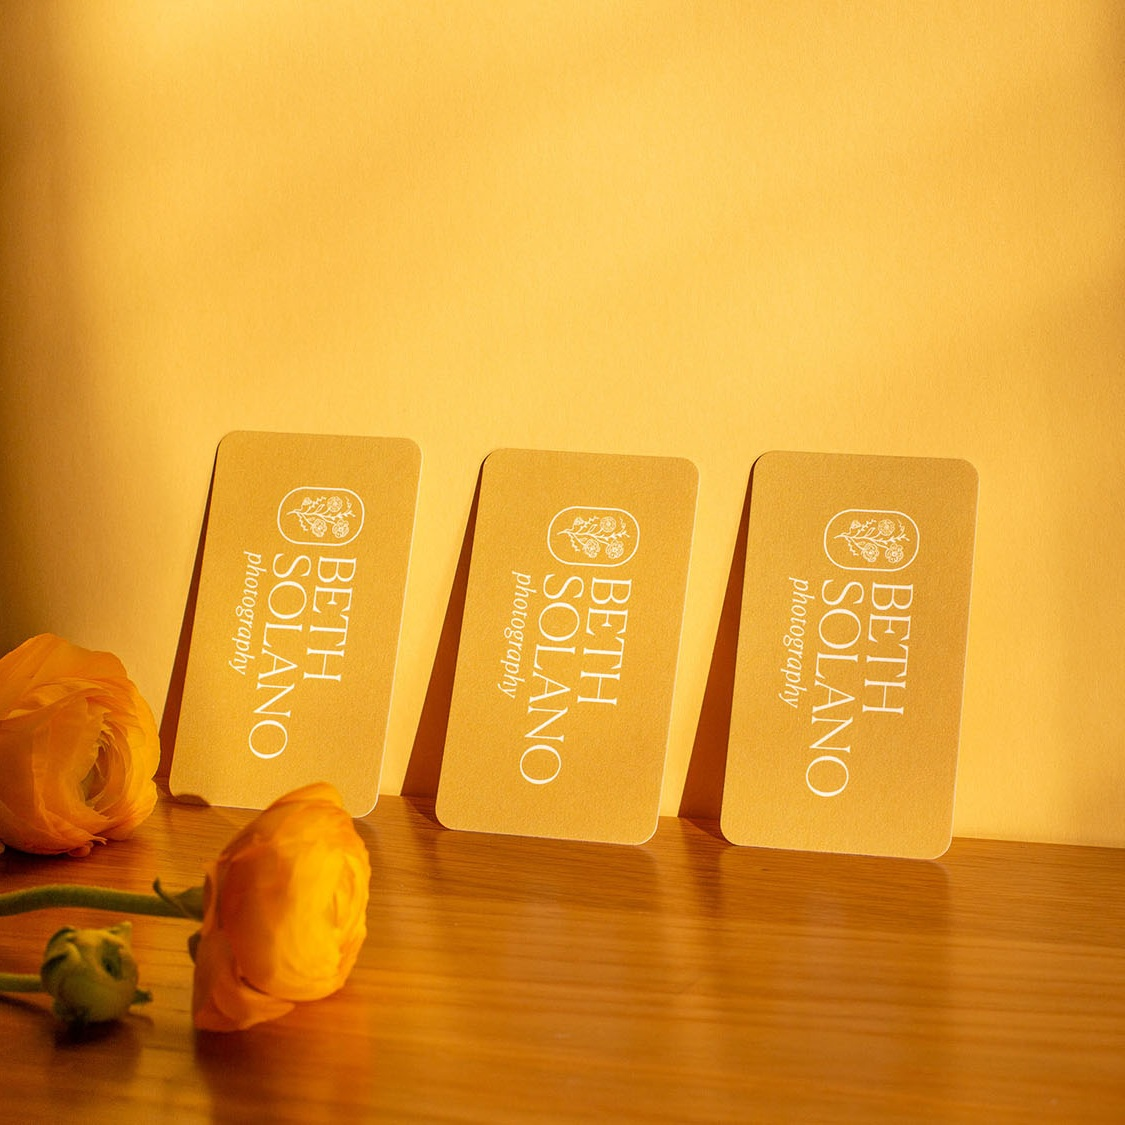 beth-solano-business-card-design-gold-mara-dawn.jpg